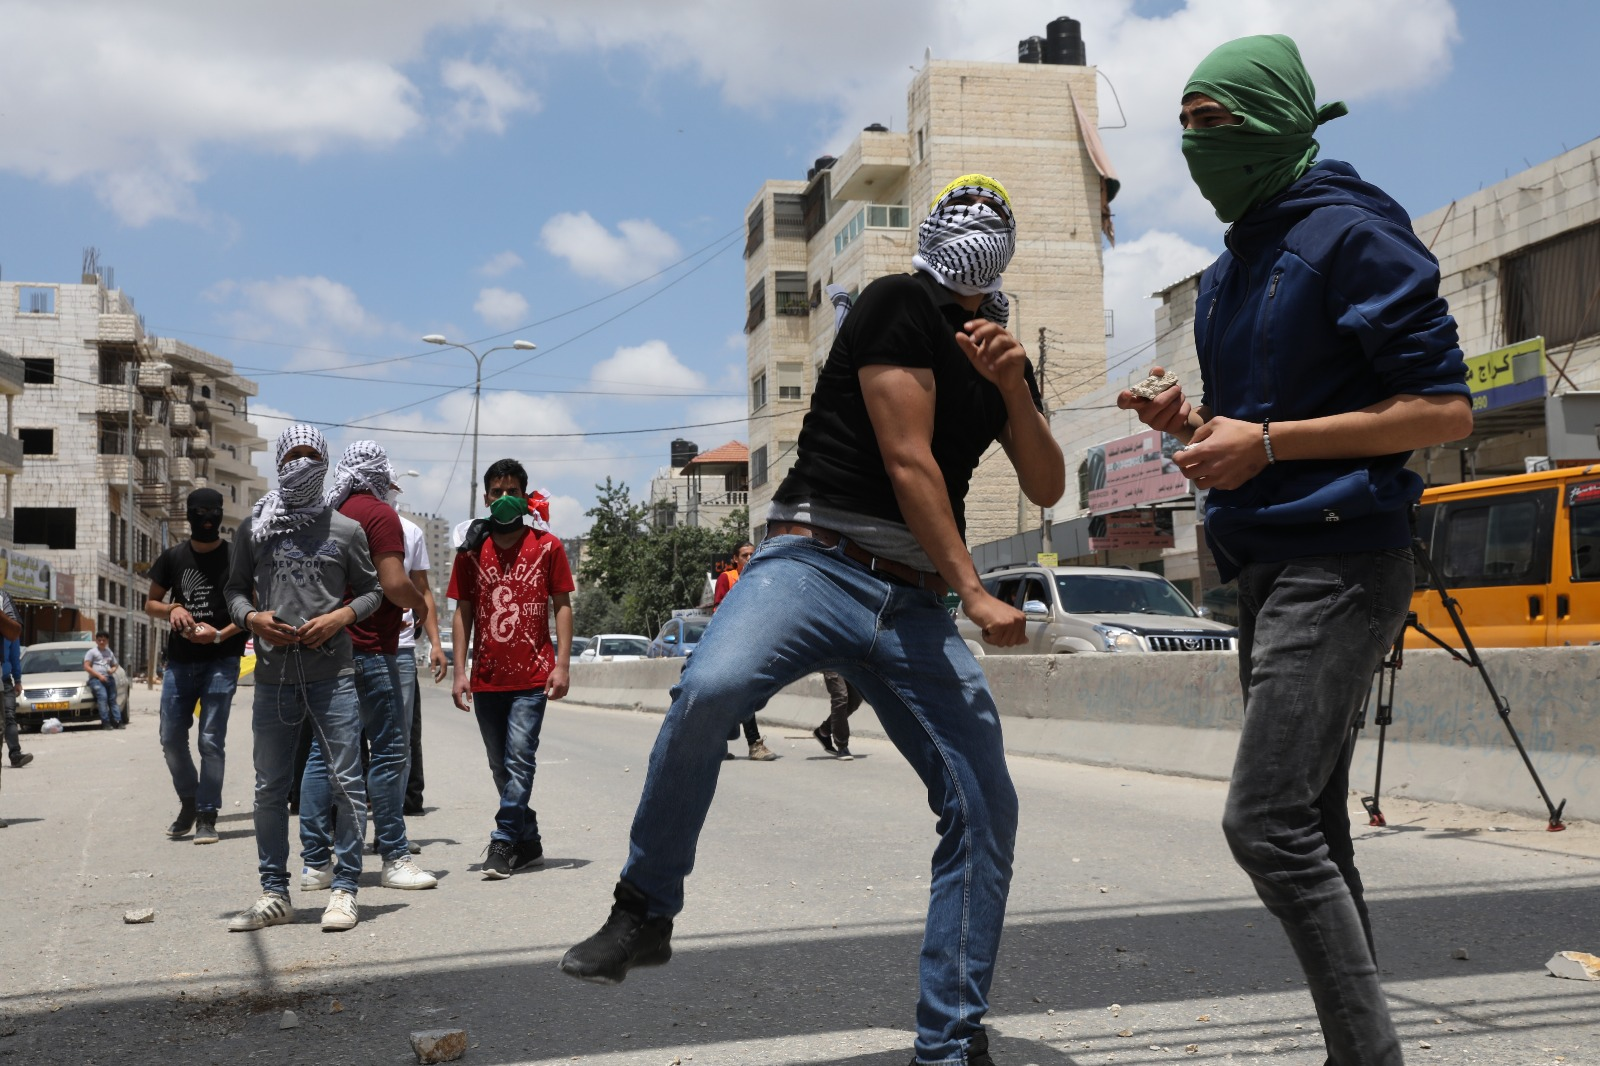 Palestinians throw stones at Israeli soldiers during clashes at Qalandiya checkpoint, near Jerusalem, May 14, 2018. (Oren Ziv/Activestills.org)